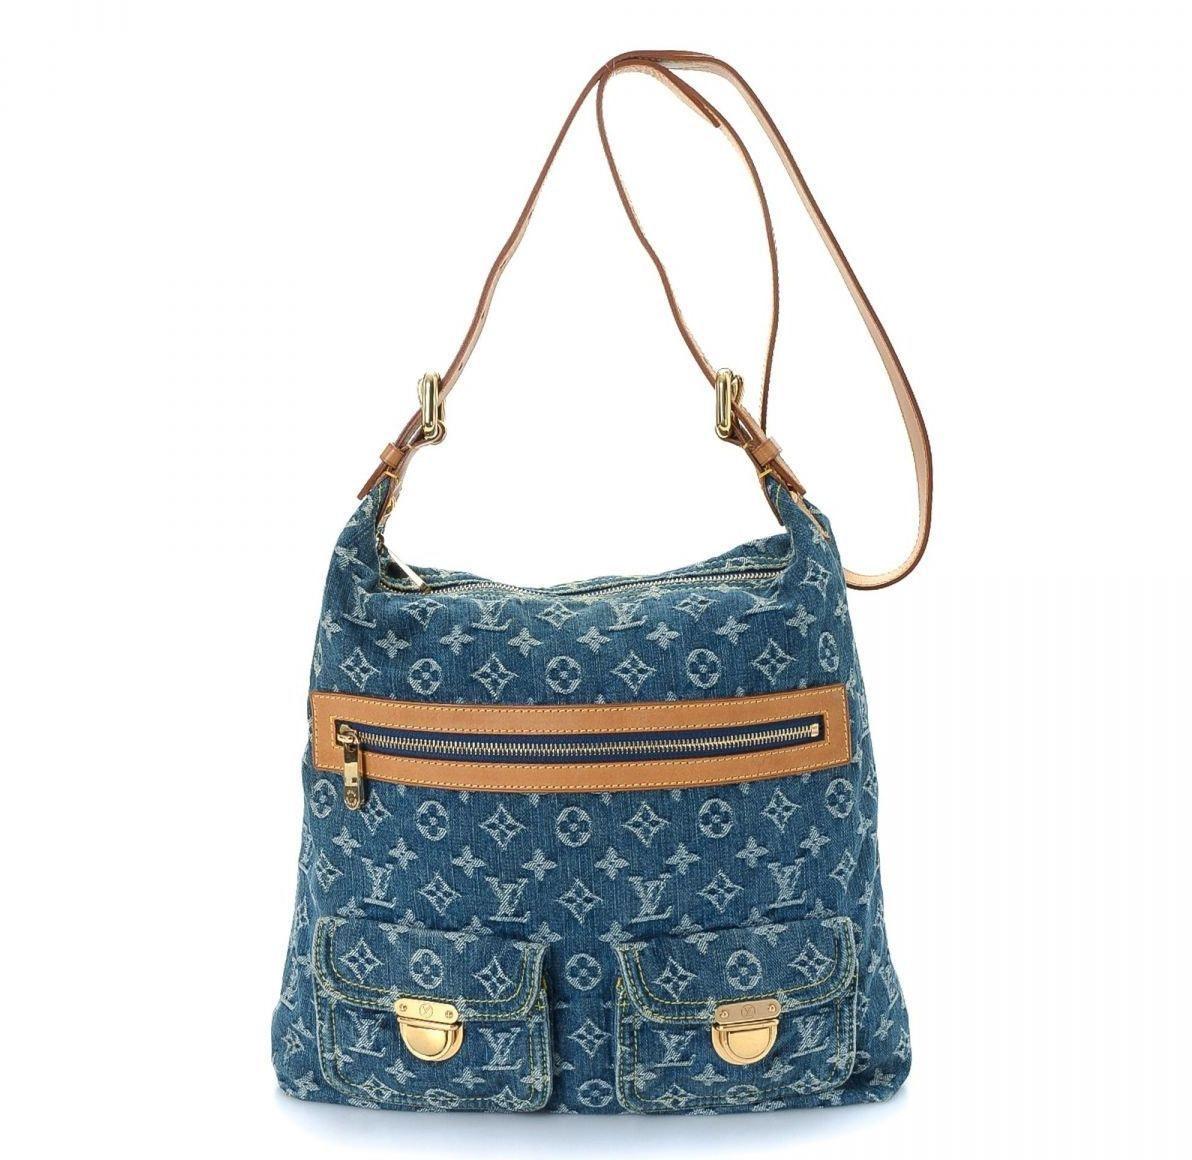 Louis Vuitton Baggy Monogram GM Blue